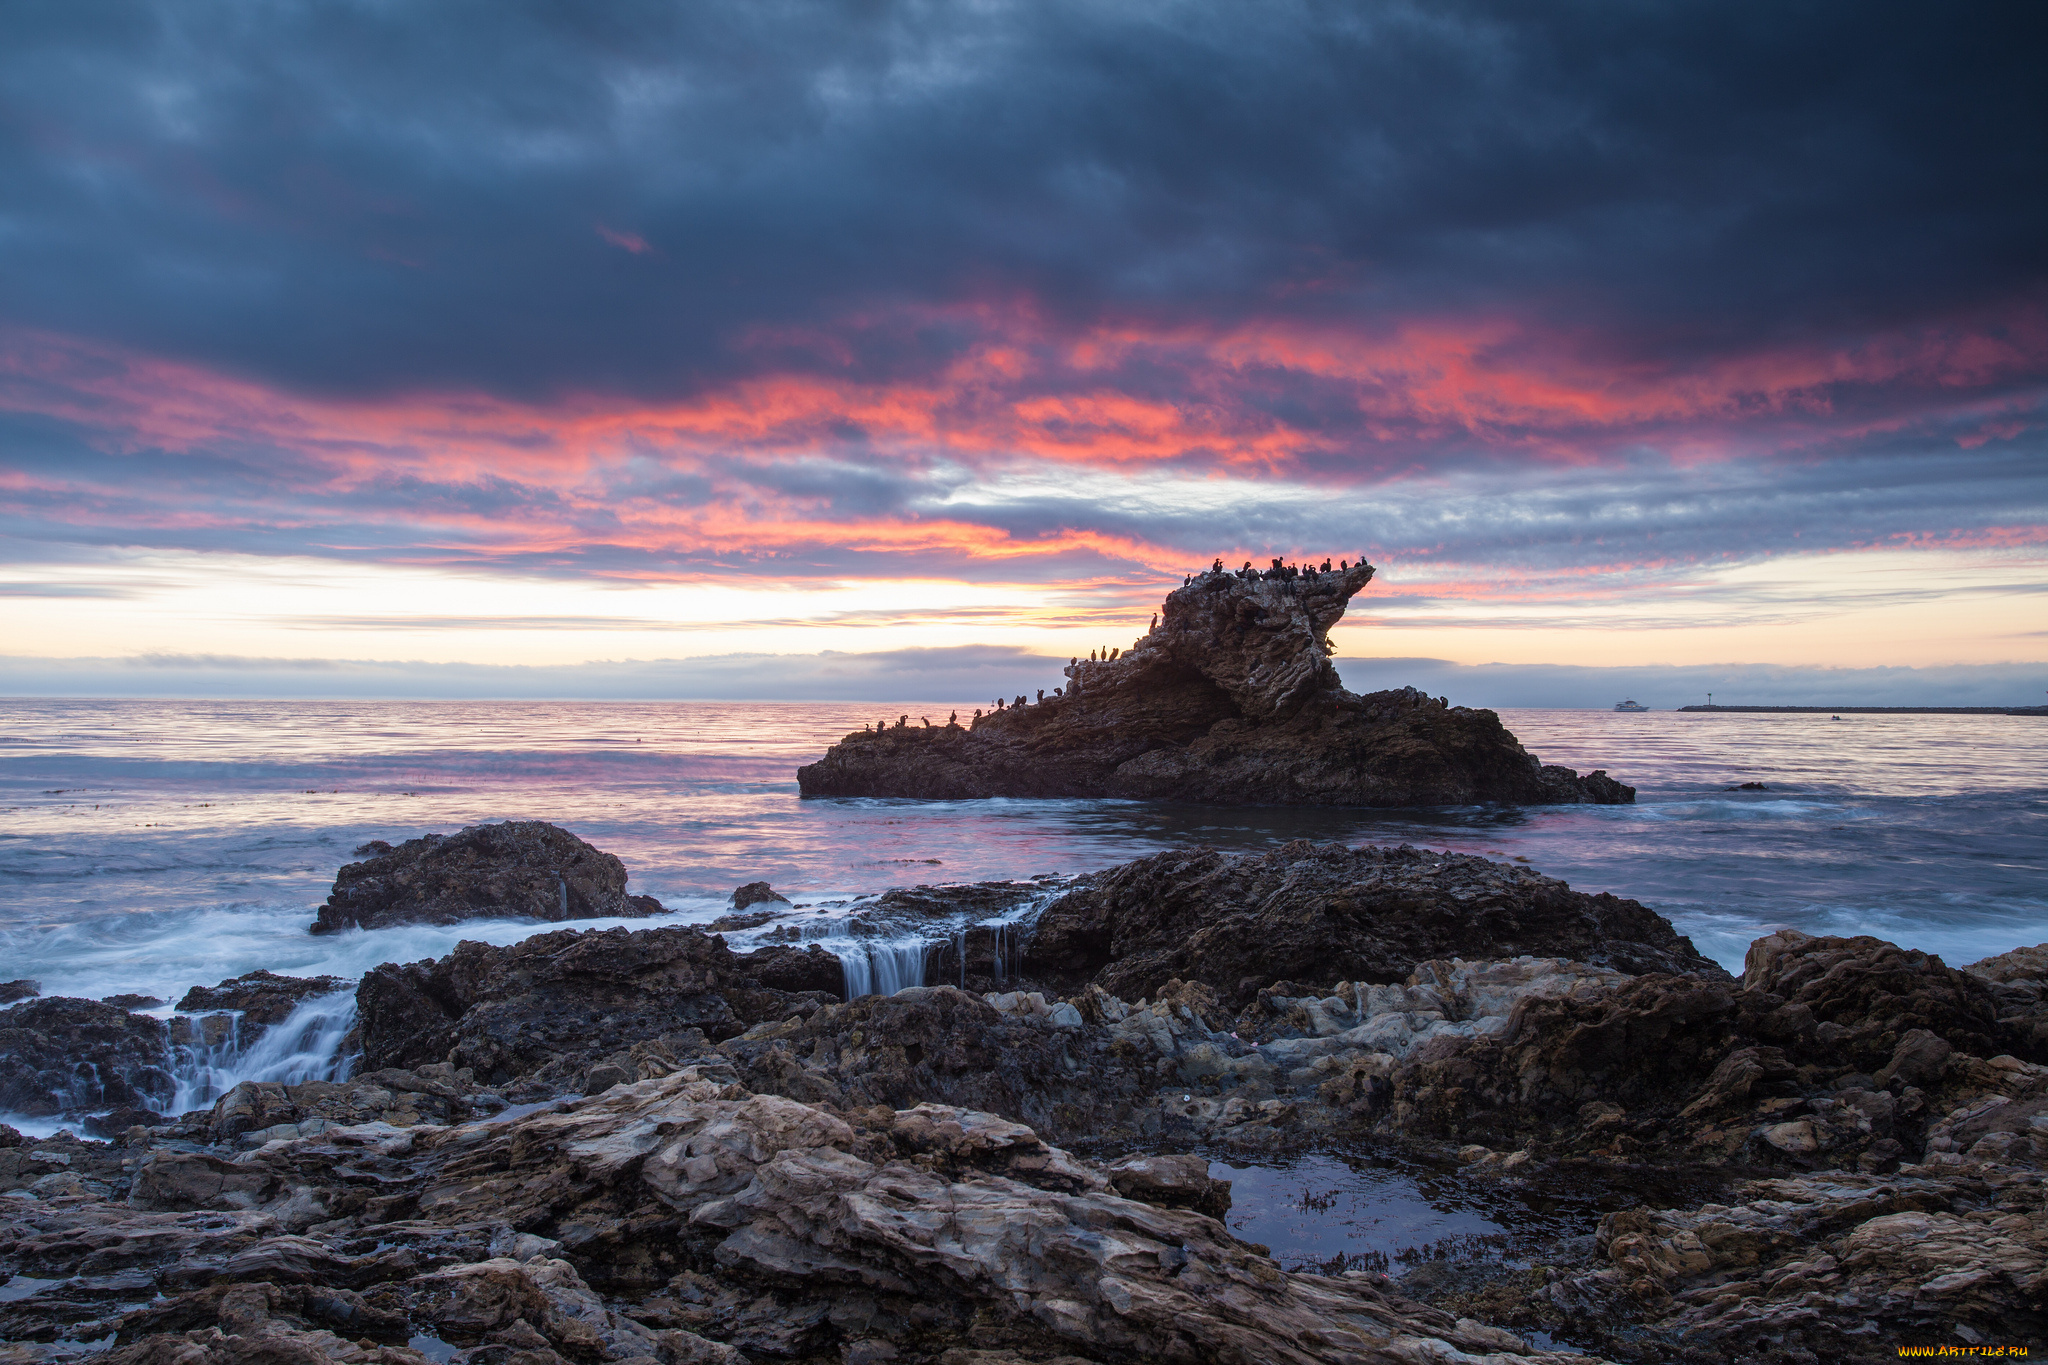 море берег камни закат sea shore stones sunset  № 1033185 загрузить